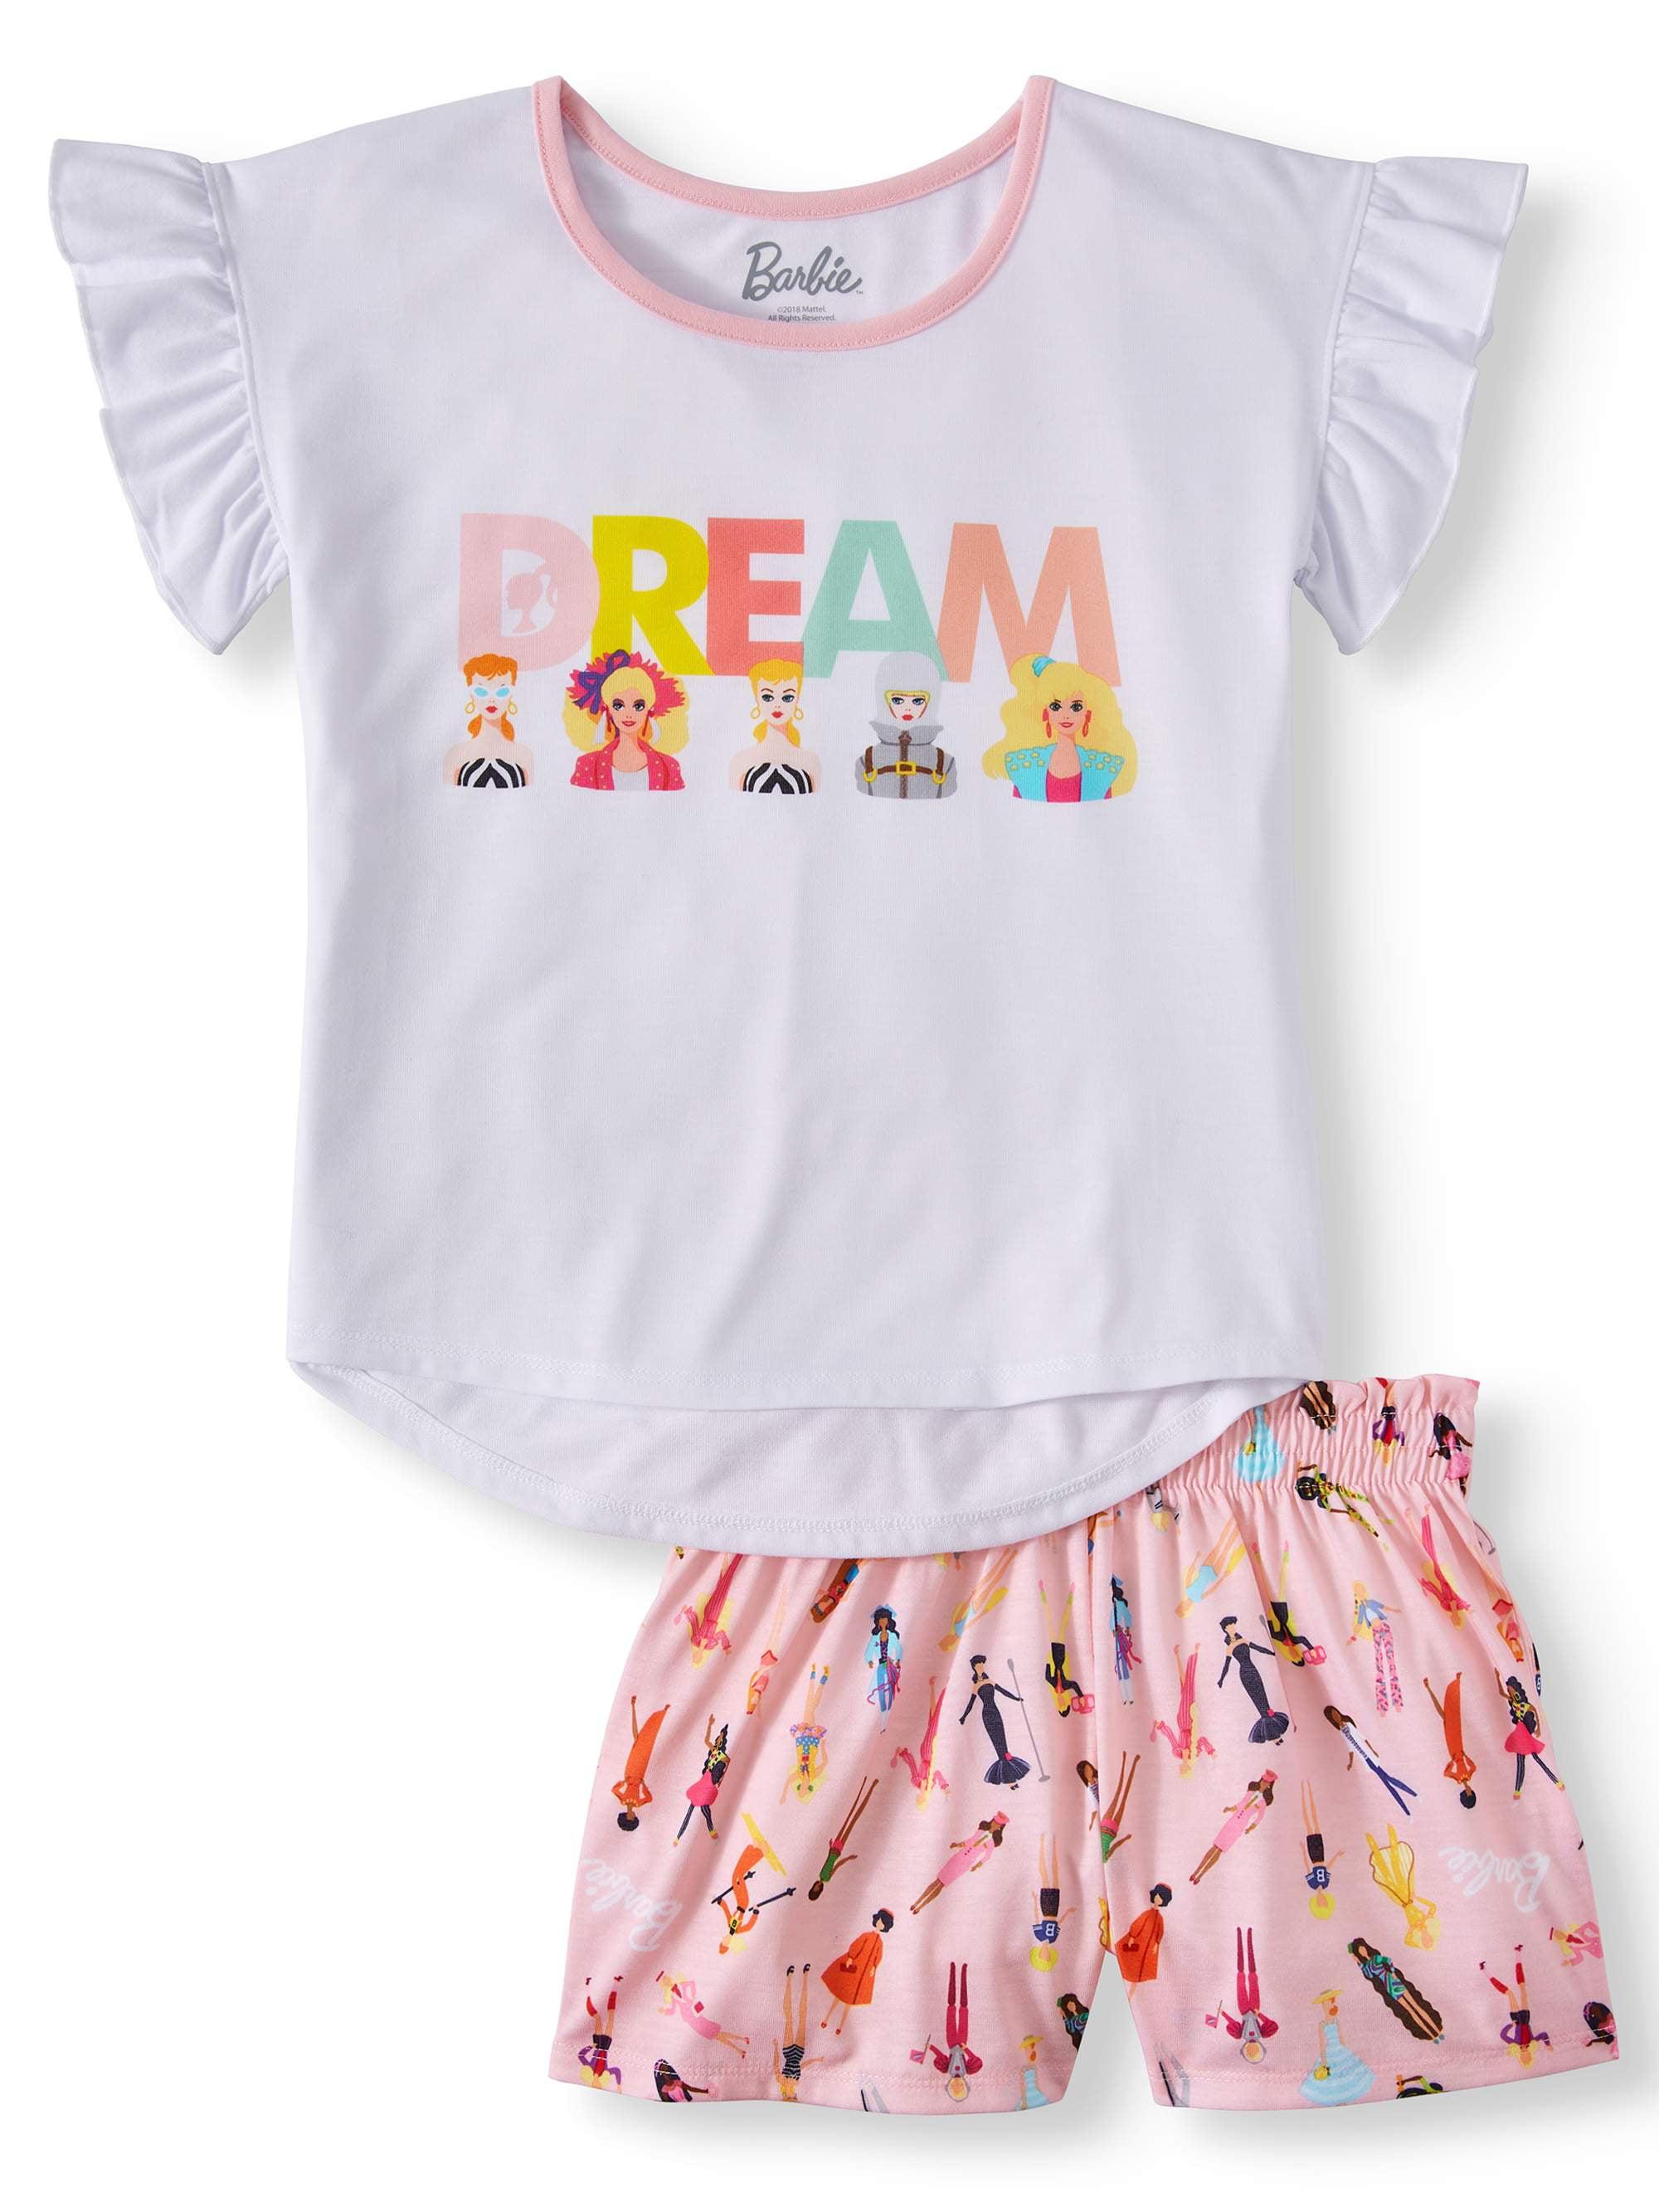 Girls' Barbie Dream 2 Piece Pajama Short Set (Little Girl & Big Girl)